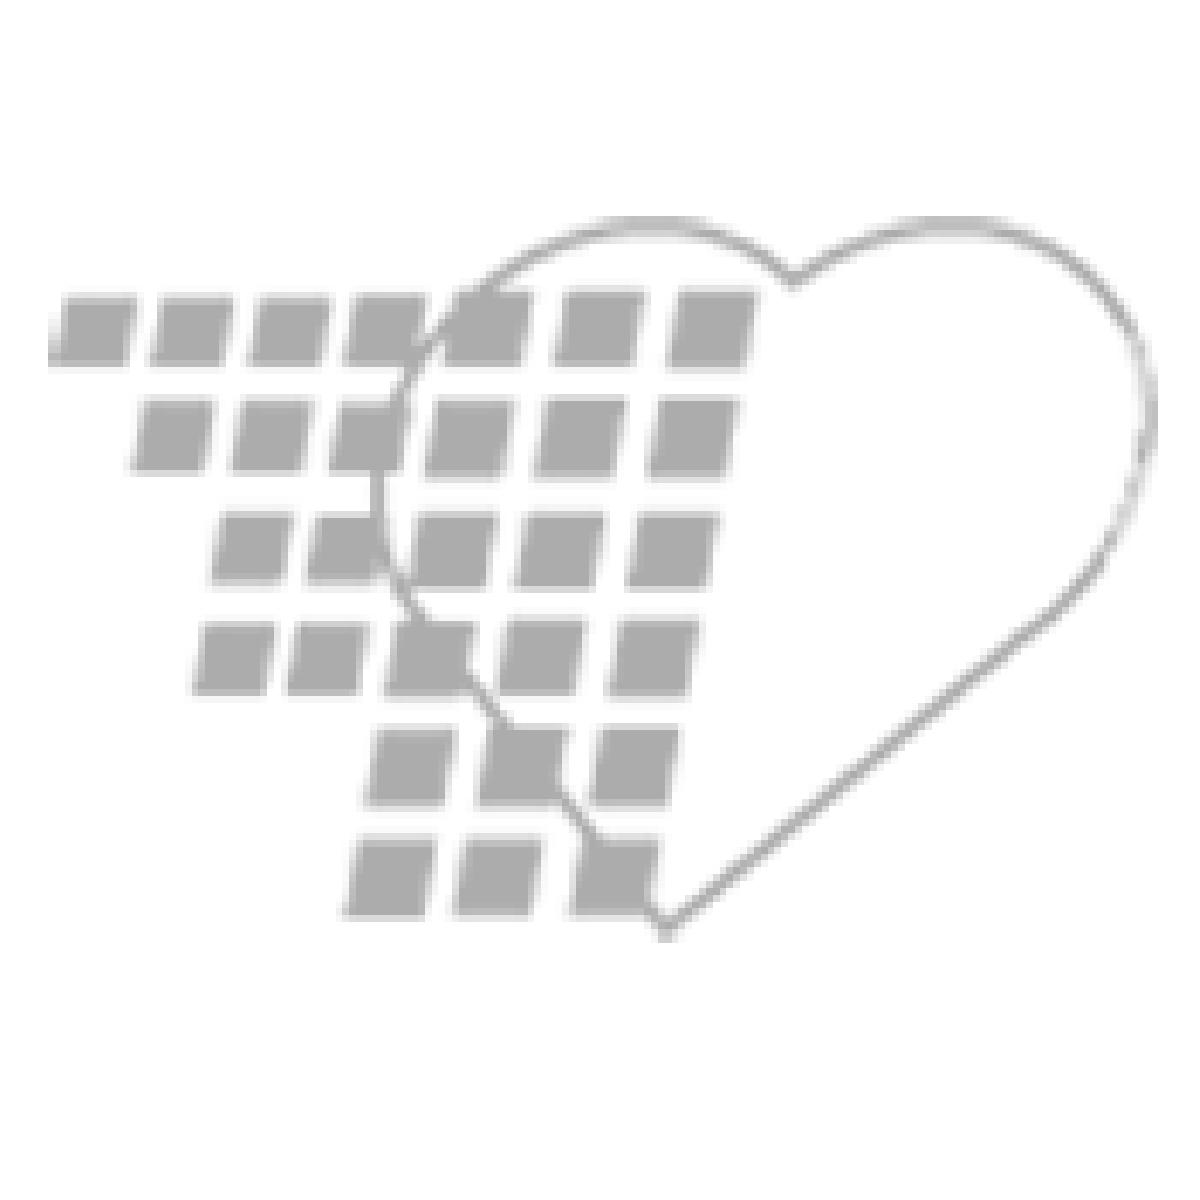 05-87-2002 Pocket Nurse® Latex-Free Closed Insert Foley Tray, Non-Sterile